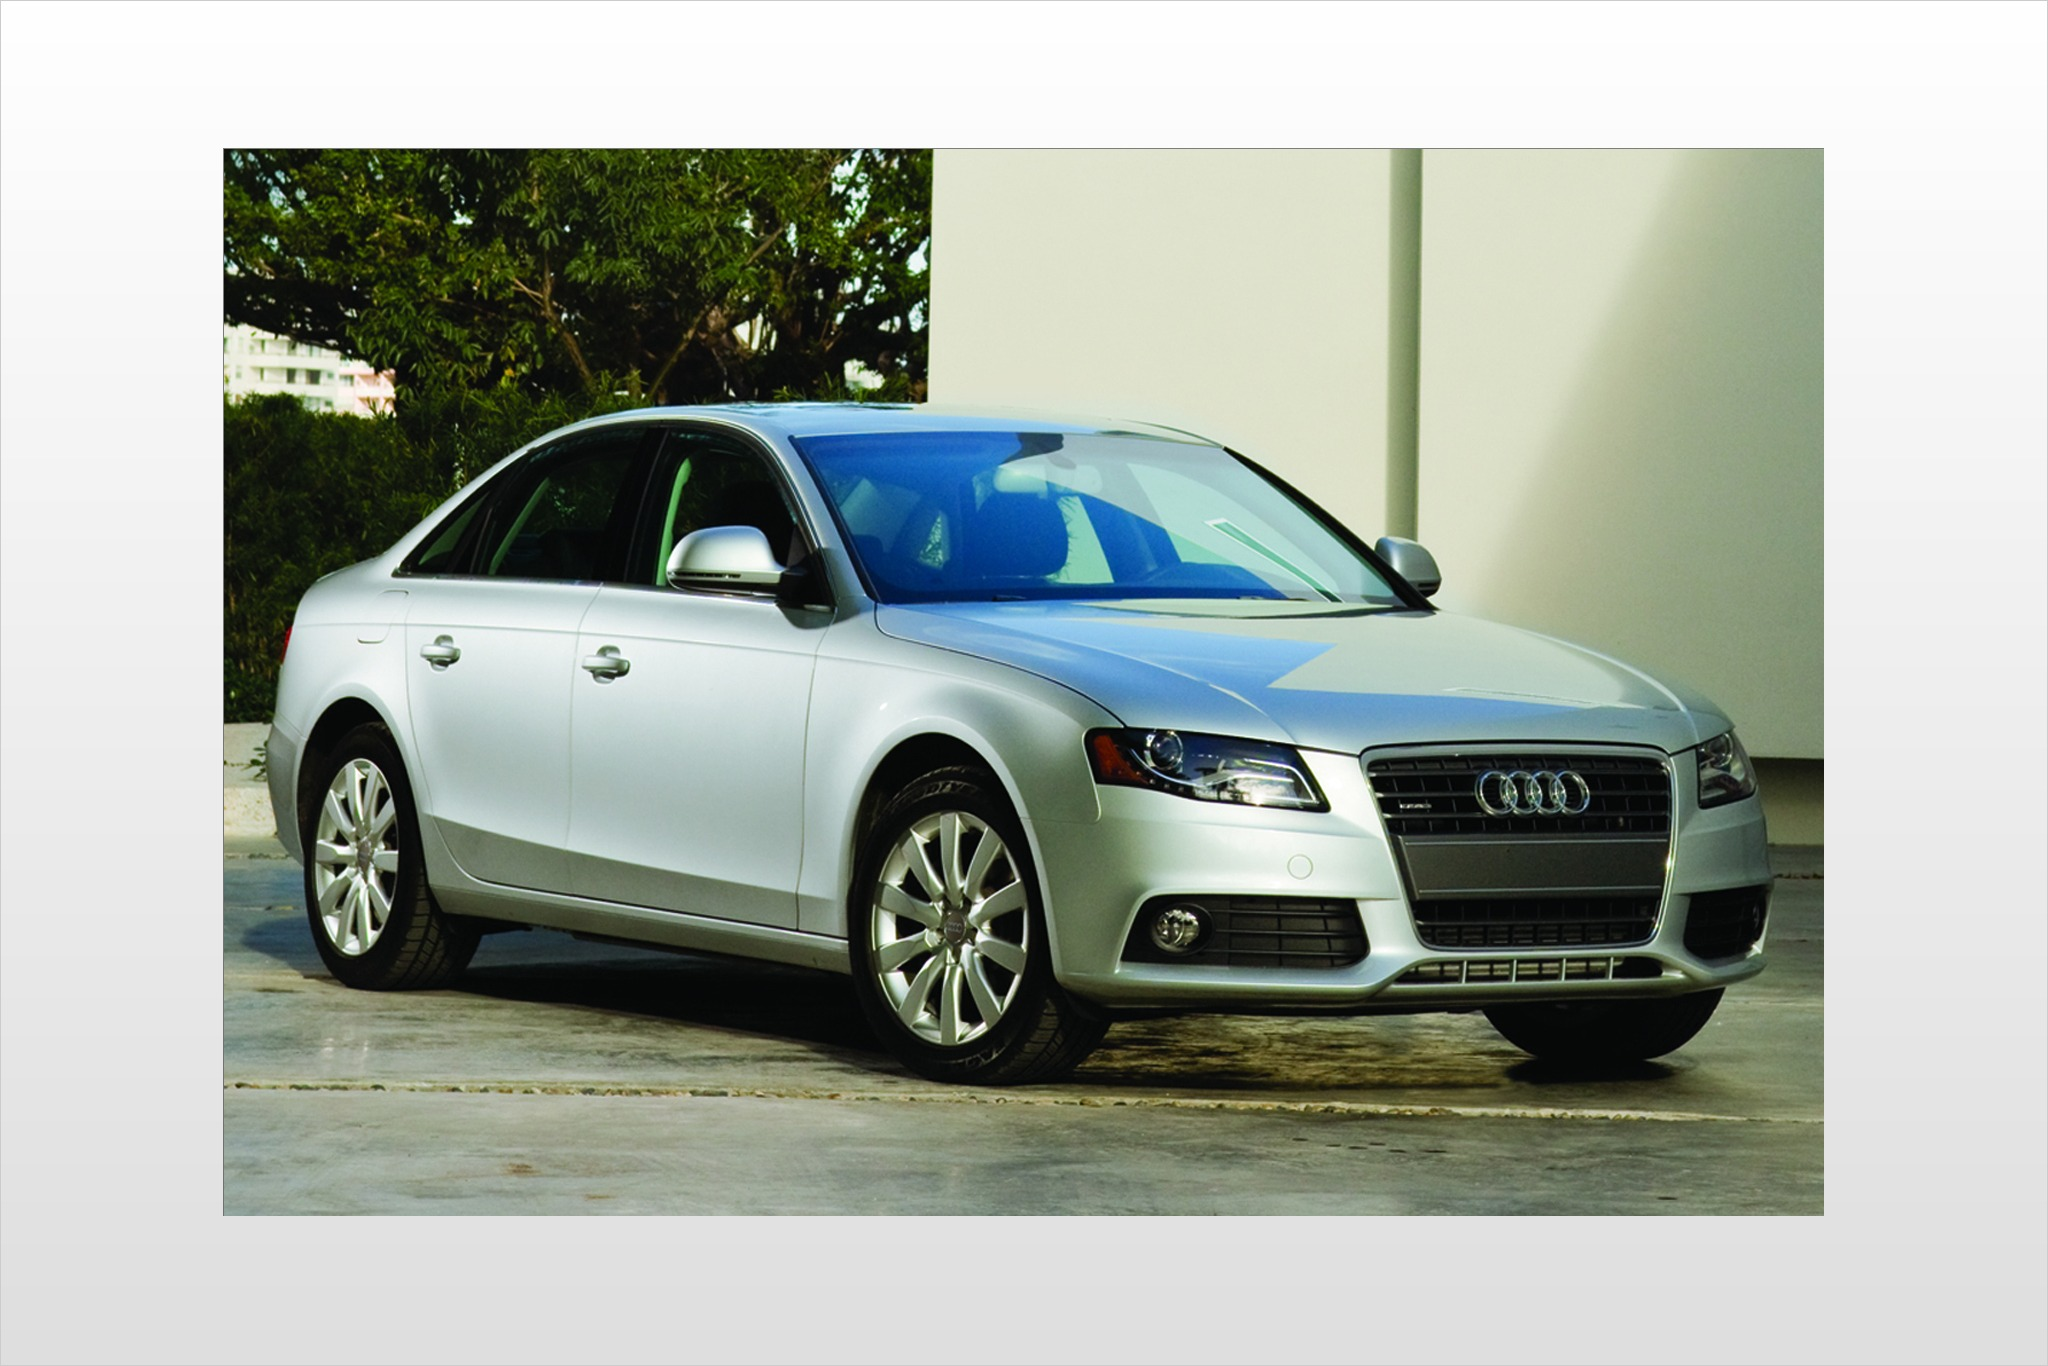 2010 Audi A4 Image 6